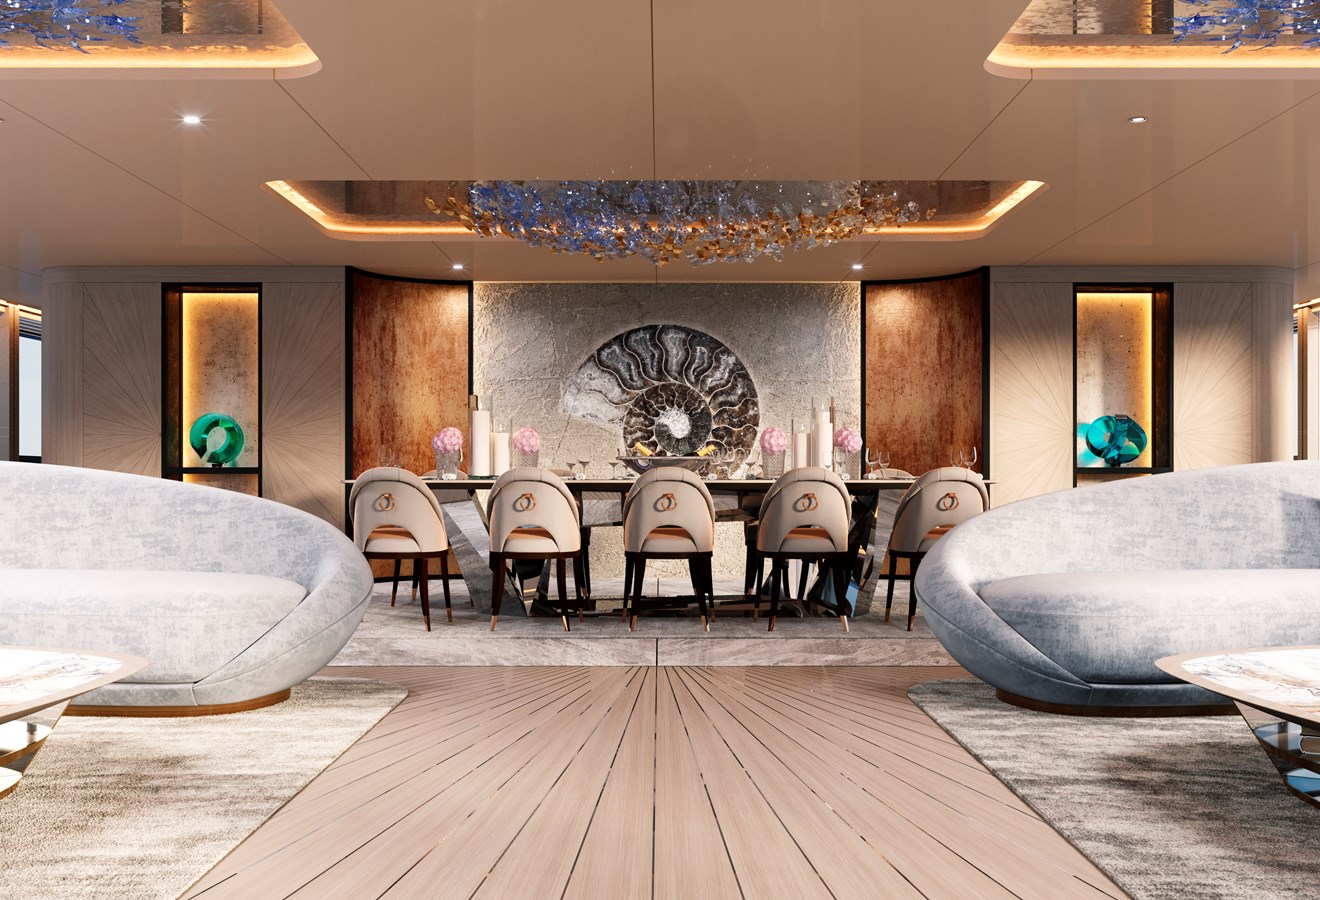 BEYOND 82M interiors- Fotiadis Design (3) 2023 CUSTOM BUILT BEYOND 82 Mega Yacht 2442972